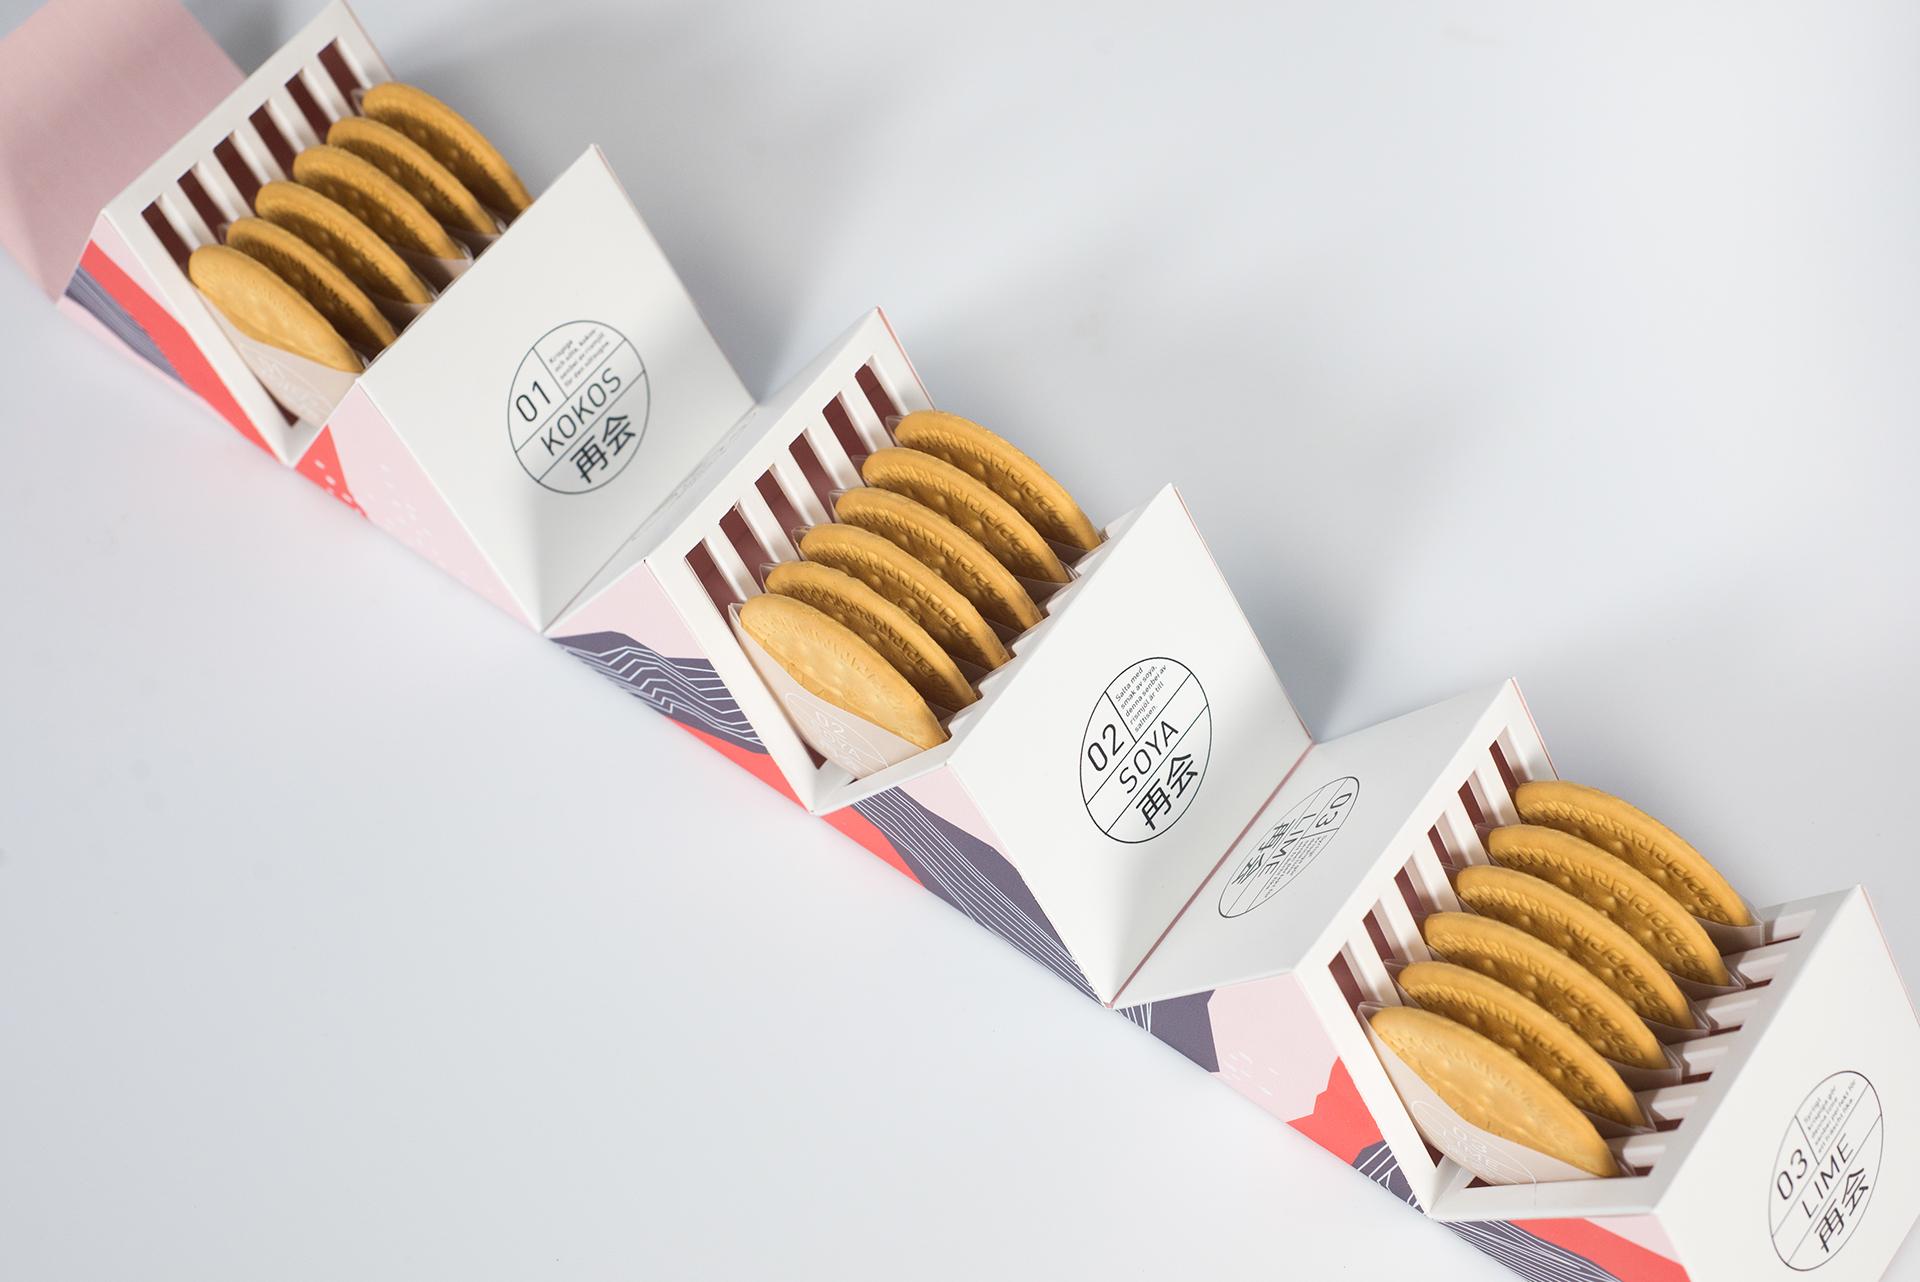 Saikai Packaging: a Japanese-Inspired Fika Brand